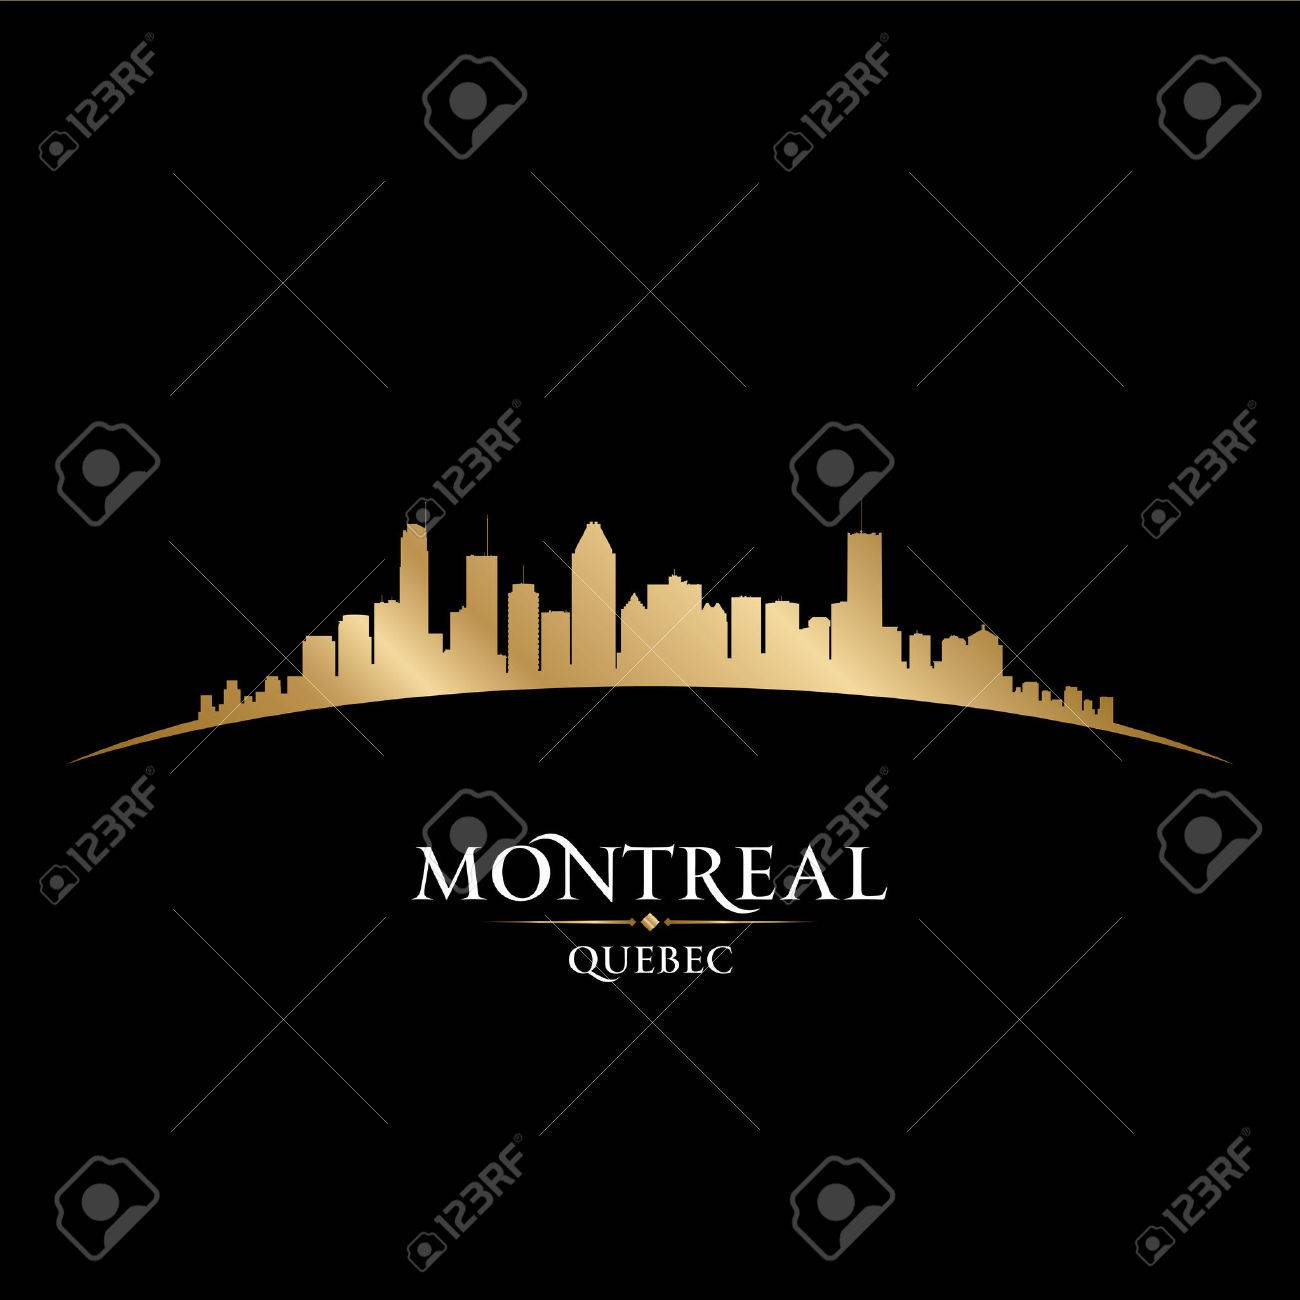 Montreal Quebec Canada city skyline silhouette. Vector illustration Stock Vector - 22867316